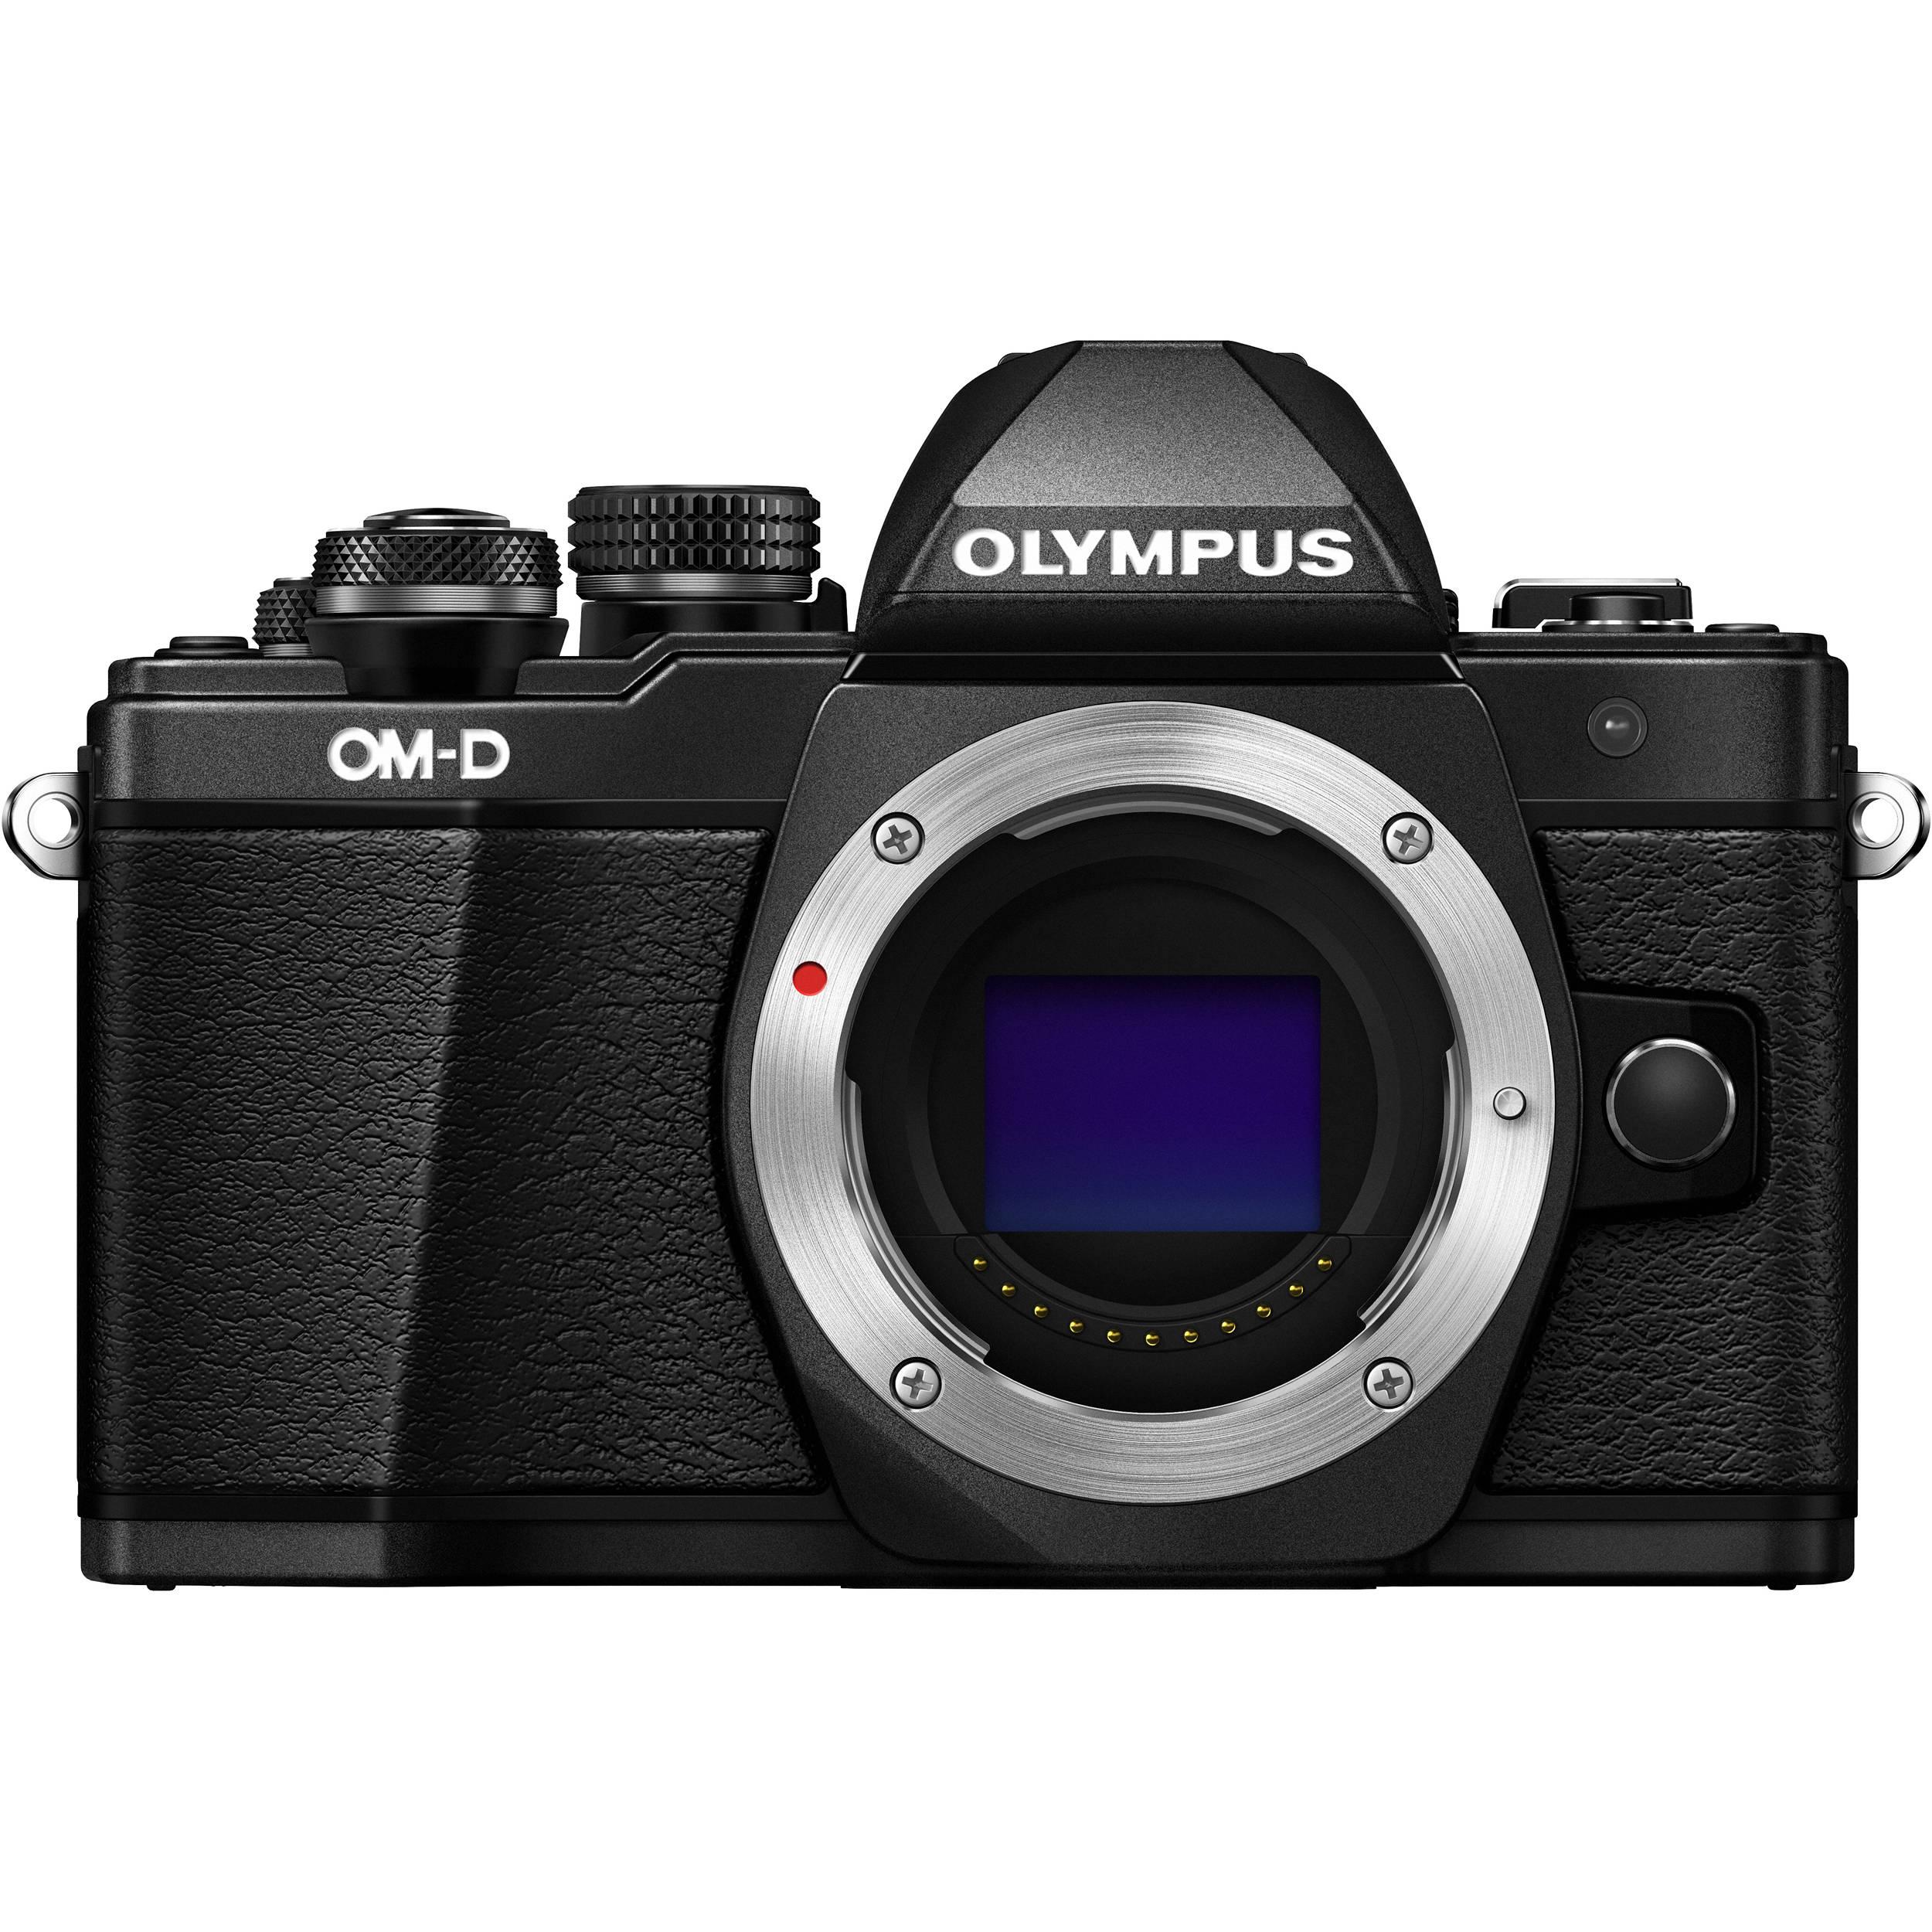 Olympus OM-D E-M10 Mark II Mirrorless Micro Four Thirds Digital Camera (